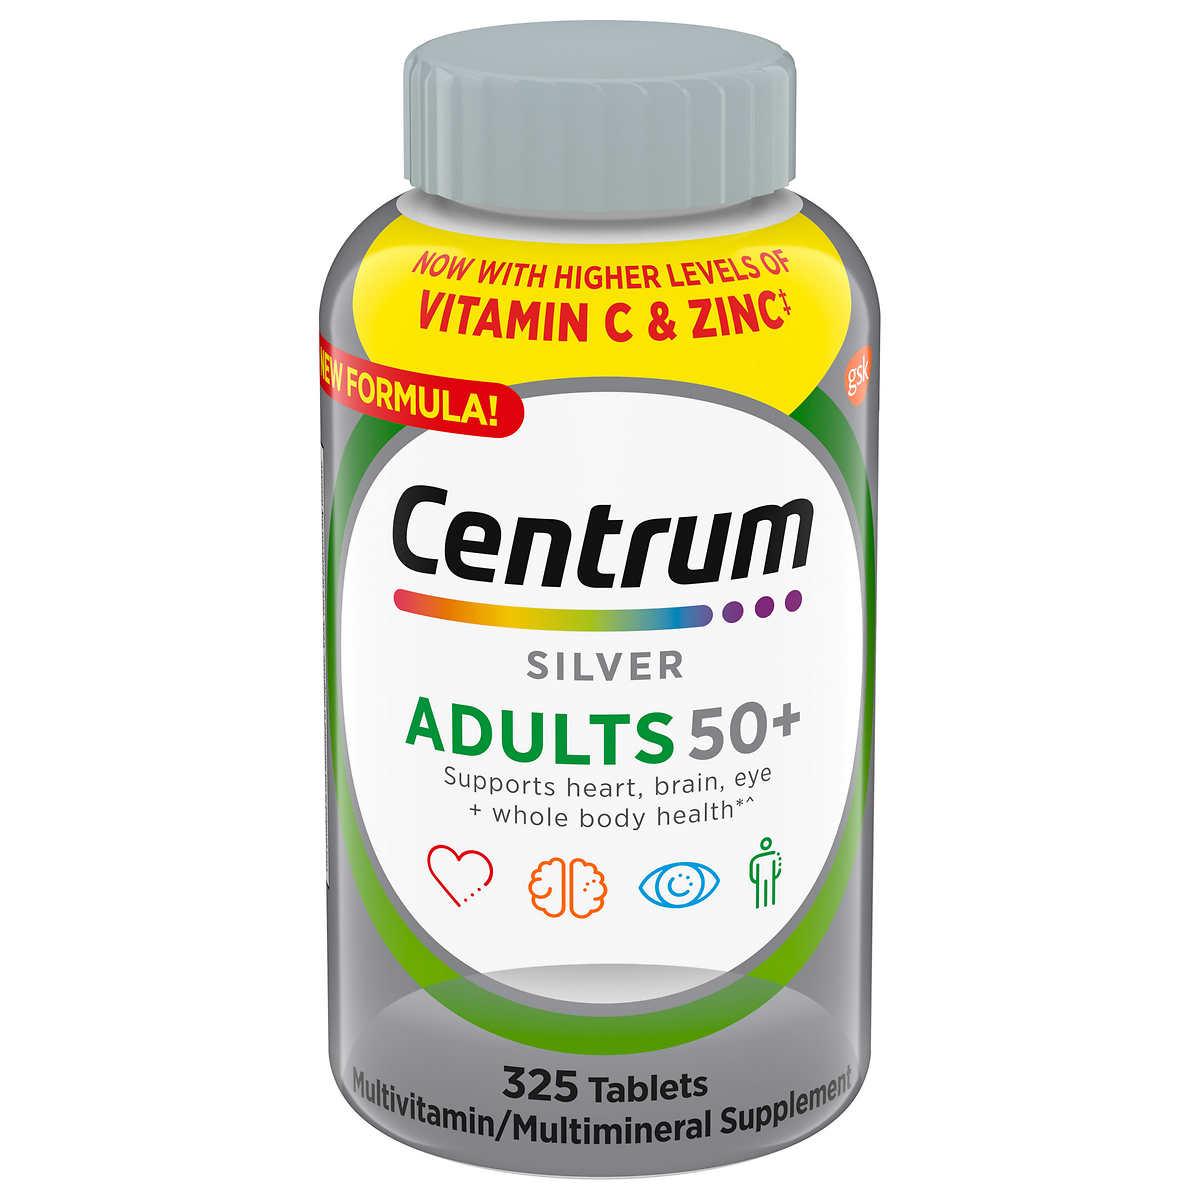 Rare good Centrum silver vitamins you tell